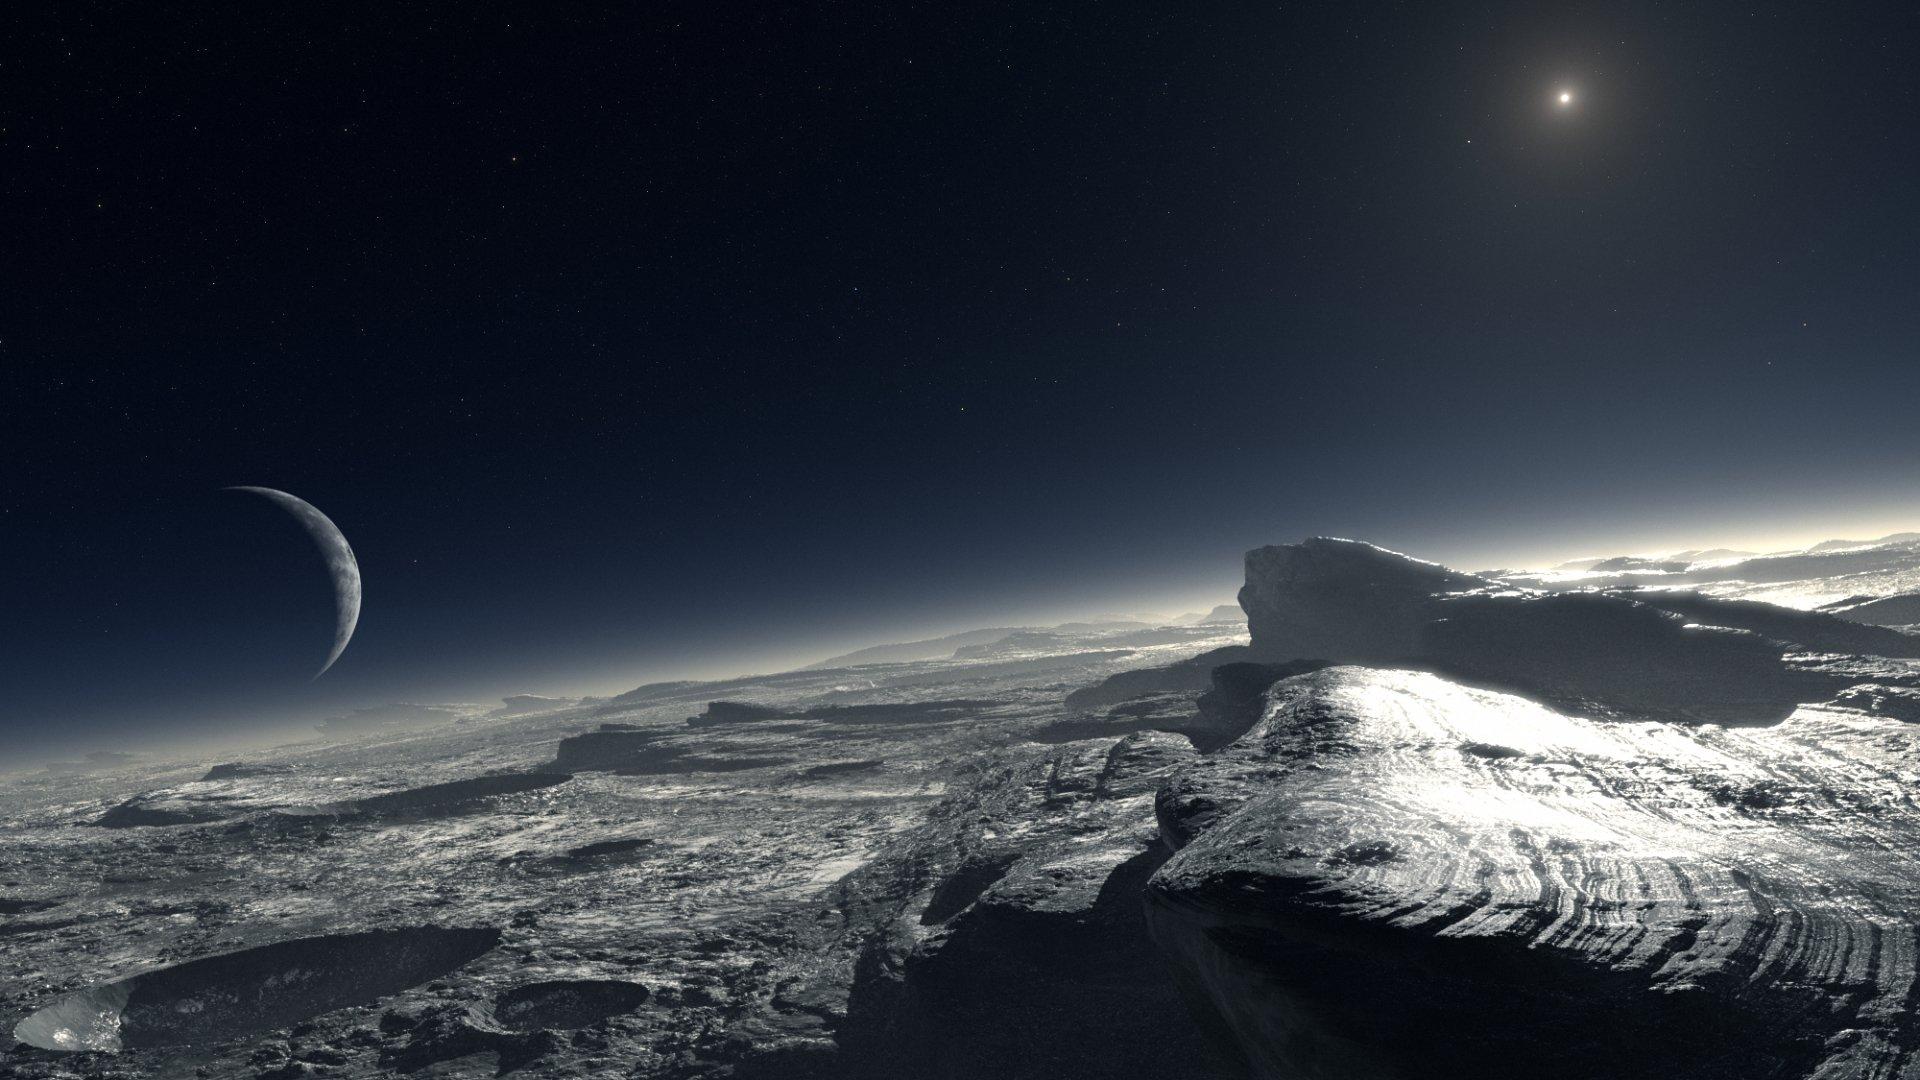 Научная Фантастика - Планетарный Ландшафт  Ландшафт Звезды Планета Научная Фантастика Обои